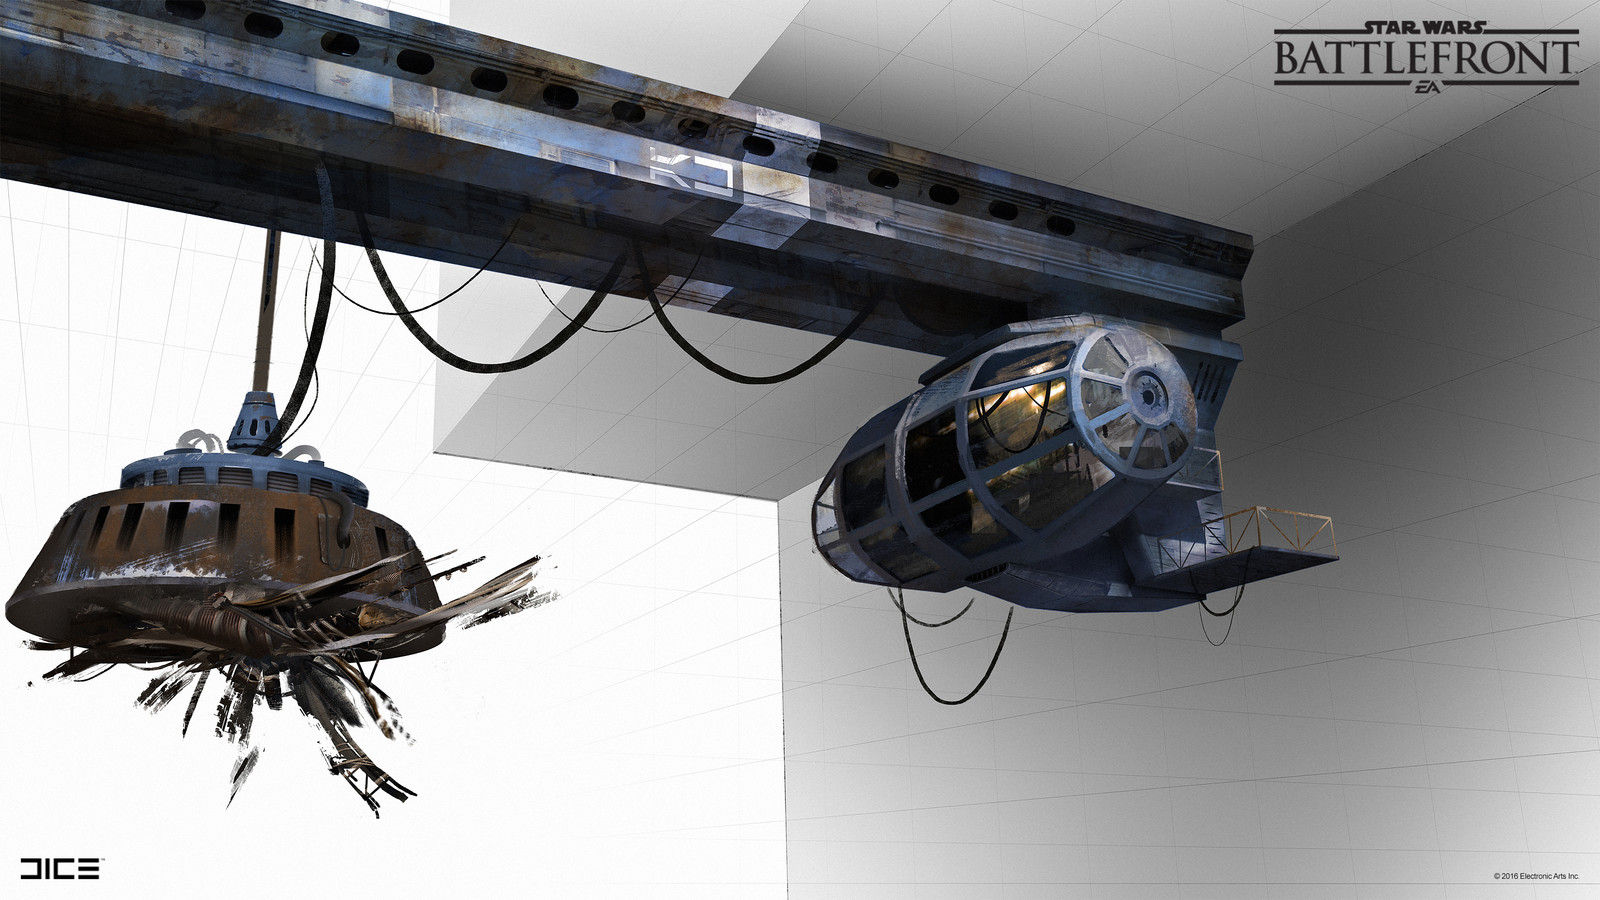 SoroSuub Crane Concept Art  for the Star Wars Battlefront Outer Rim DLC. (2015)